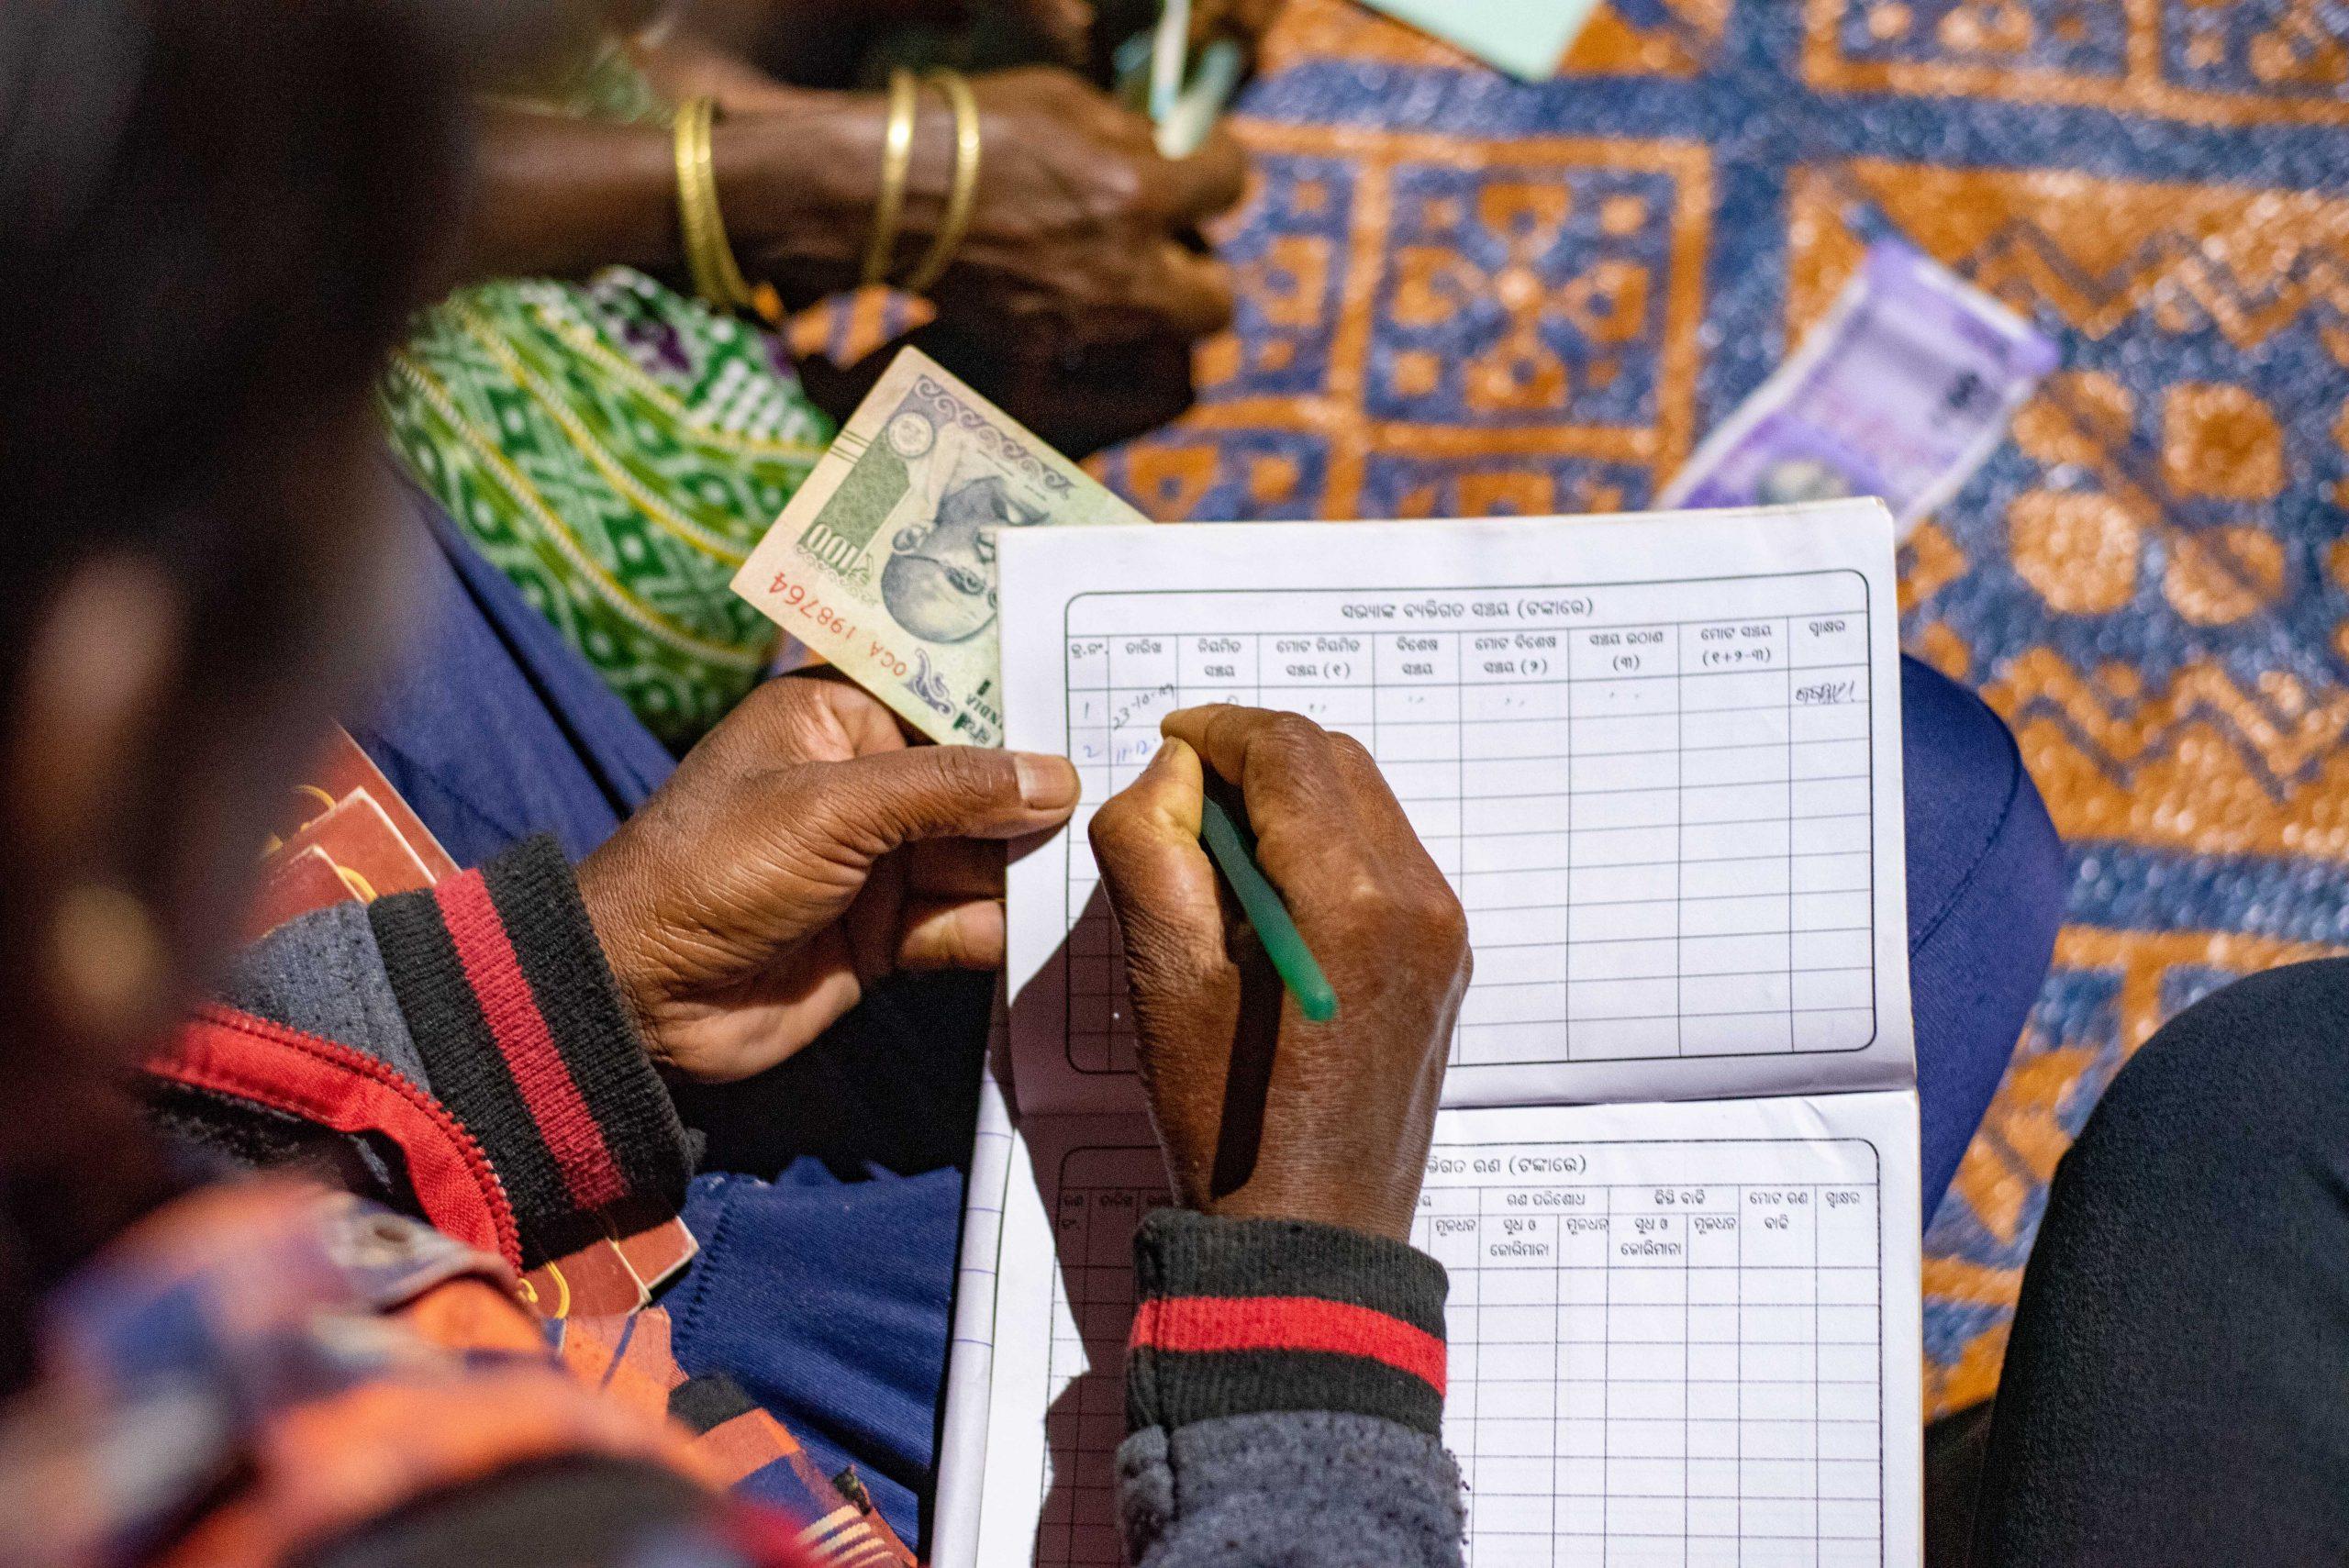 A fieldworker making an entry in a financial ledger